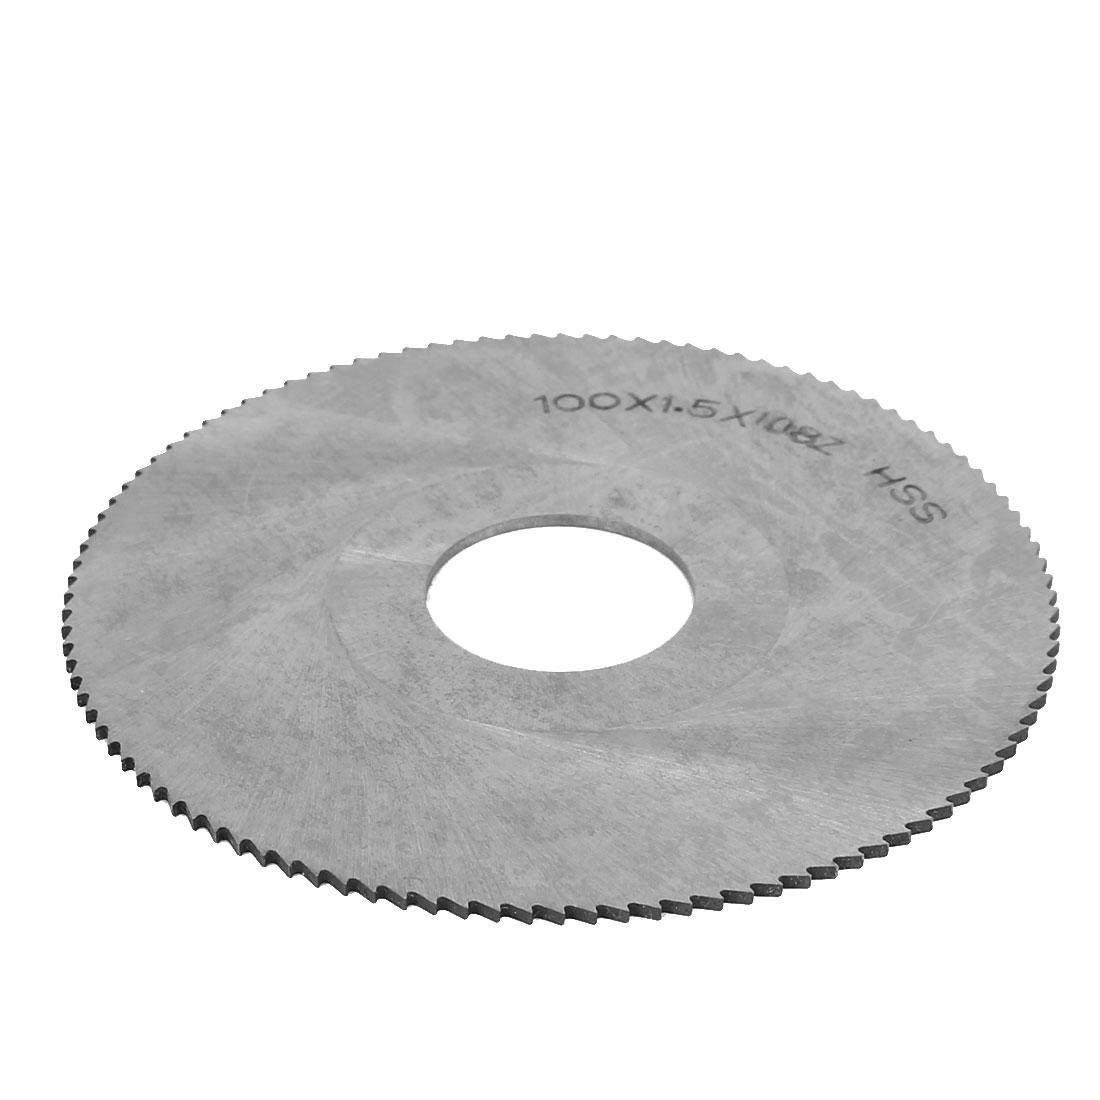 100mm Dia 1.5mm Thickness Slitting Slotting Circular Saw Cutting Disc Wheel Blade